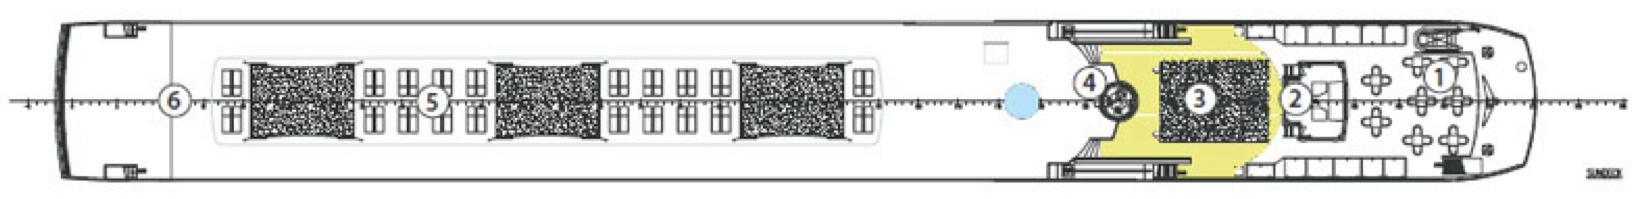 Avalon Artistry II-deckplan-Sky Deck